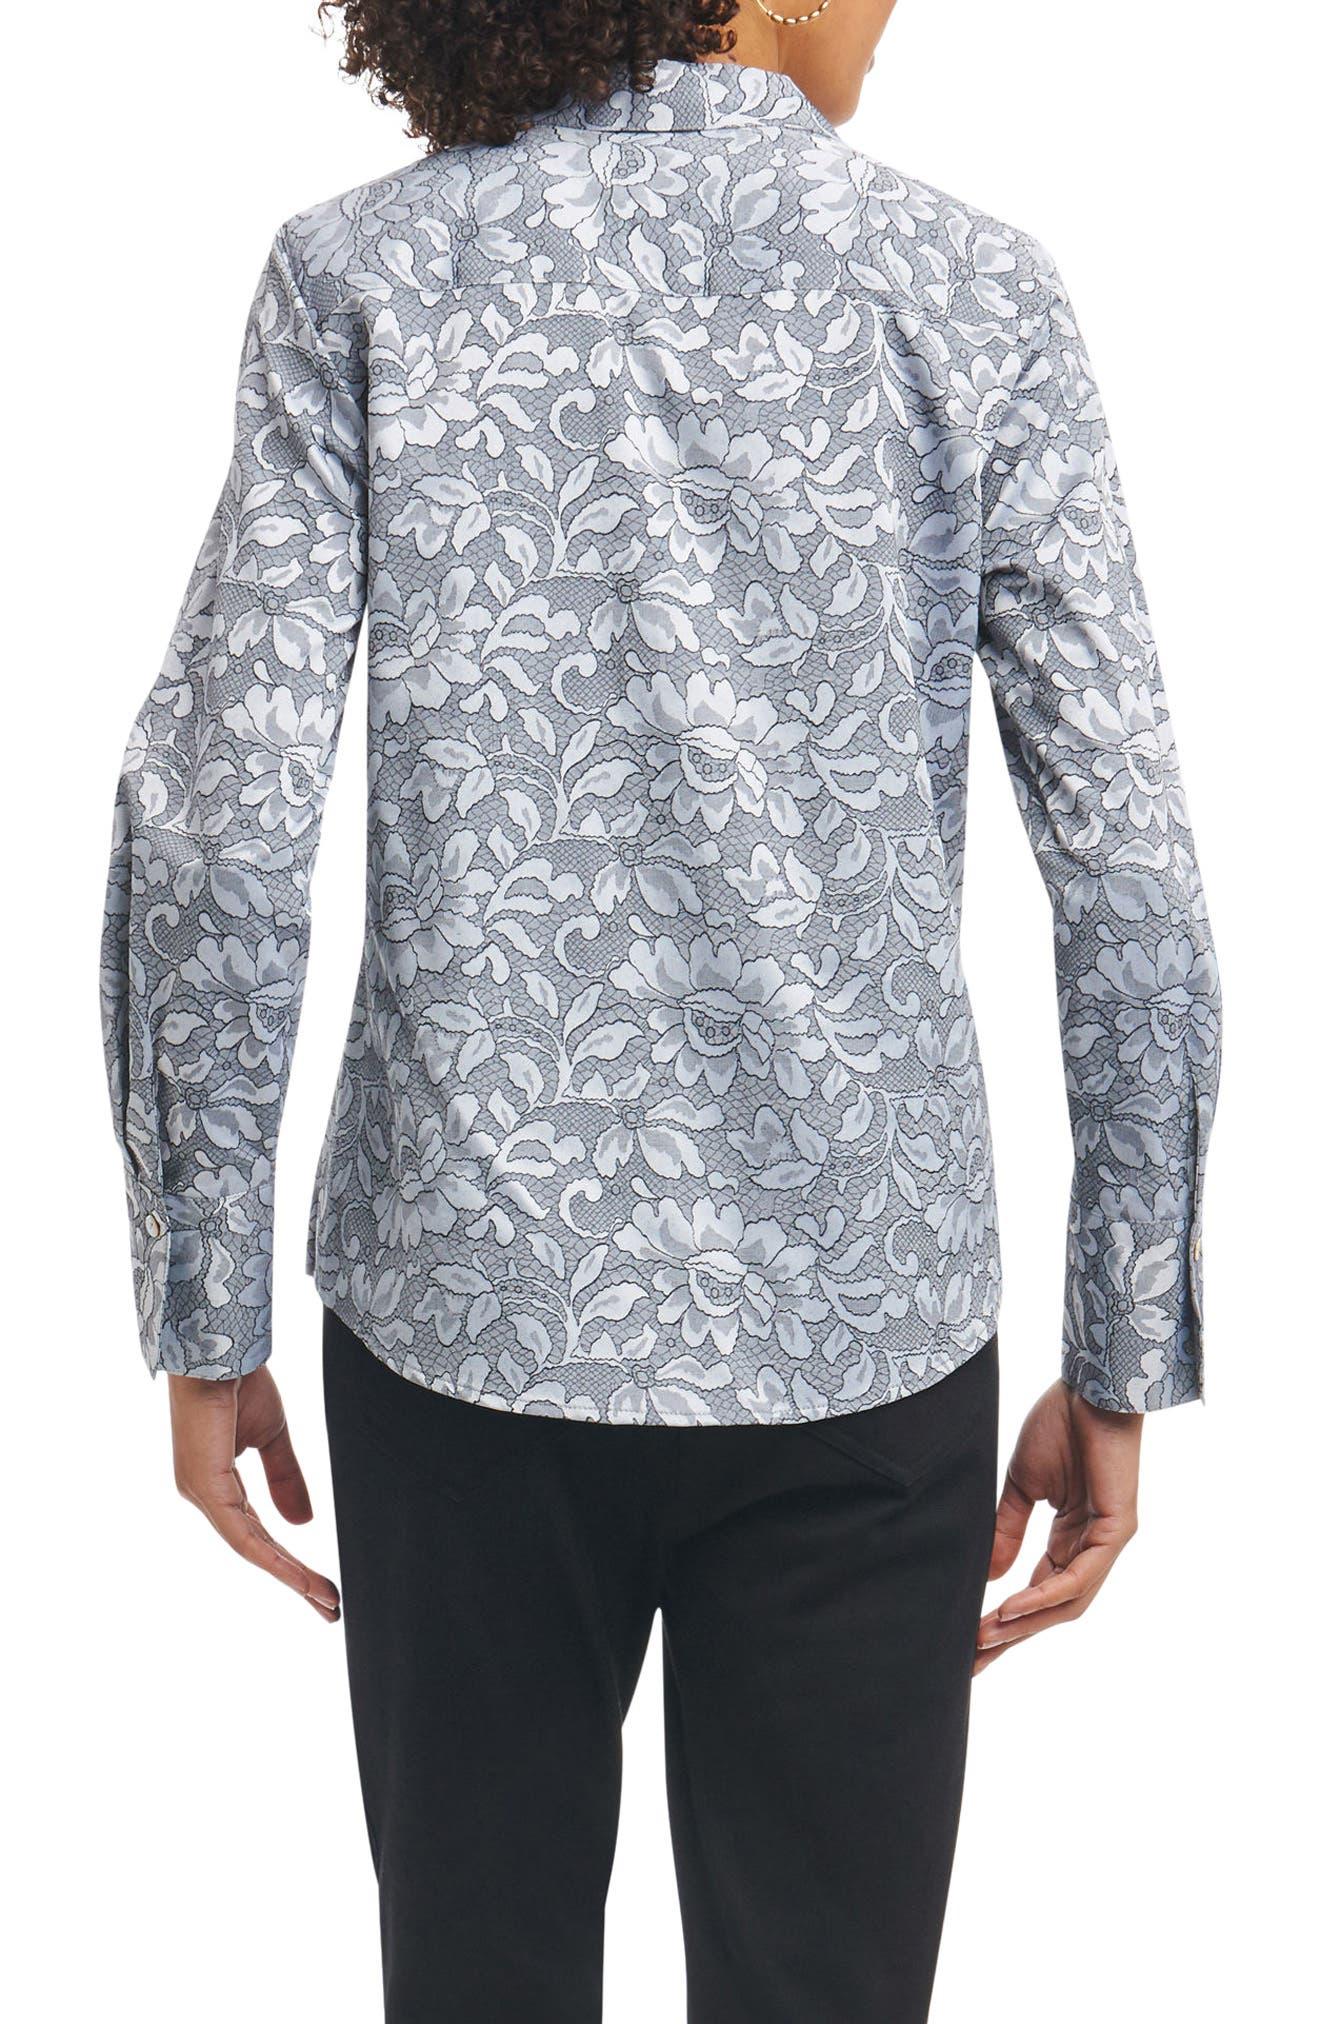 Alternate Image 2  - Foxcroft Rhonda Wrinkle Free Lace Jacquard Shirt